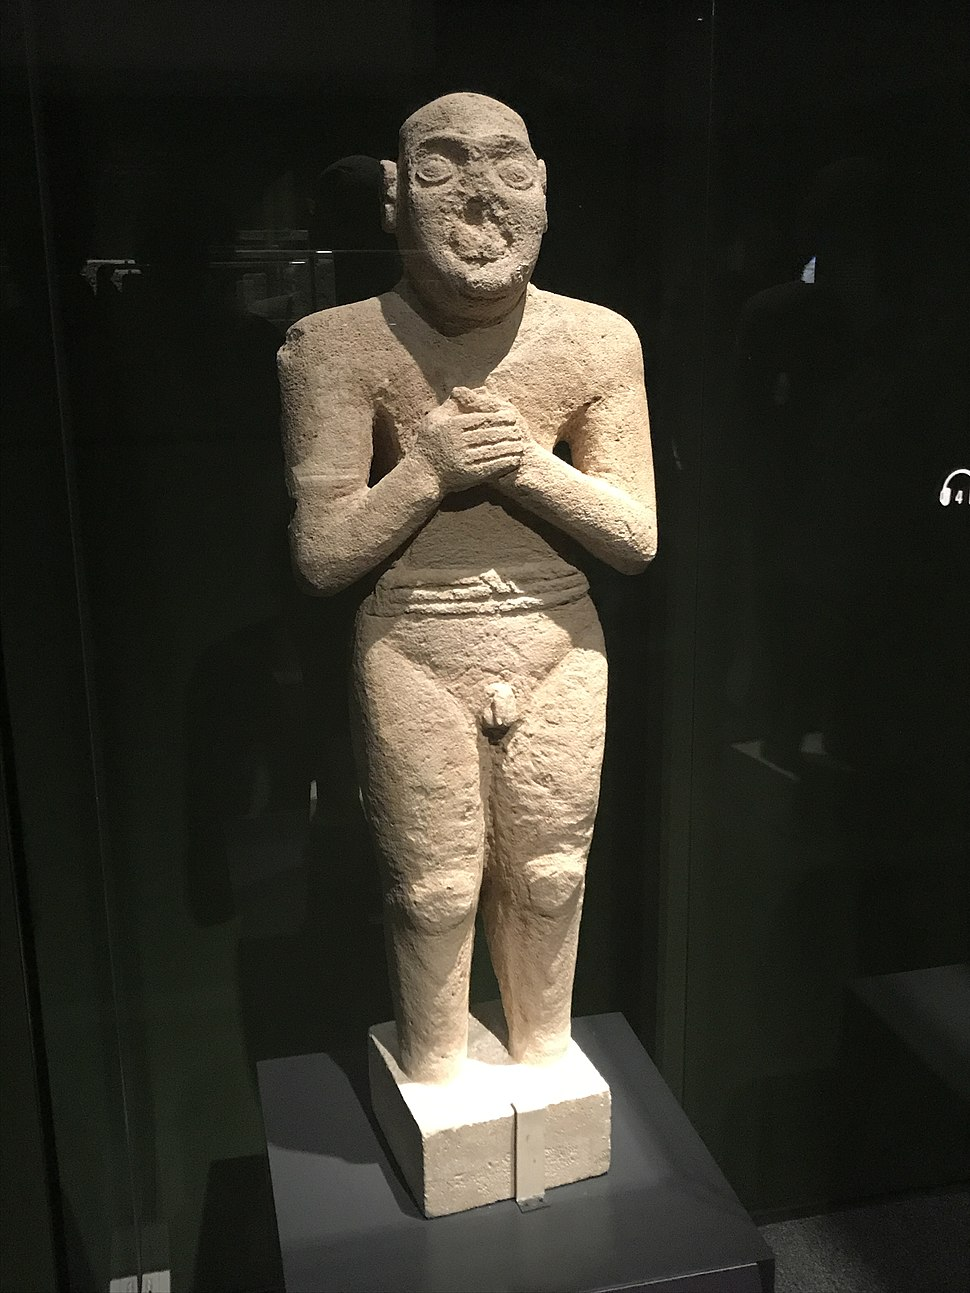 Statue at National Museum of Korea